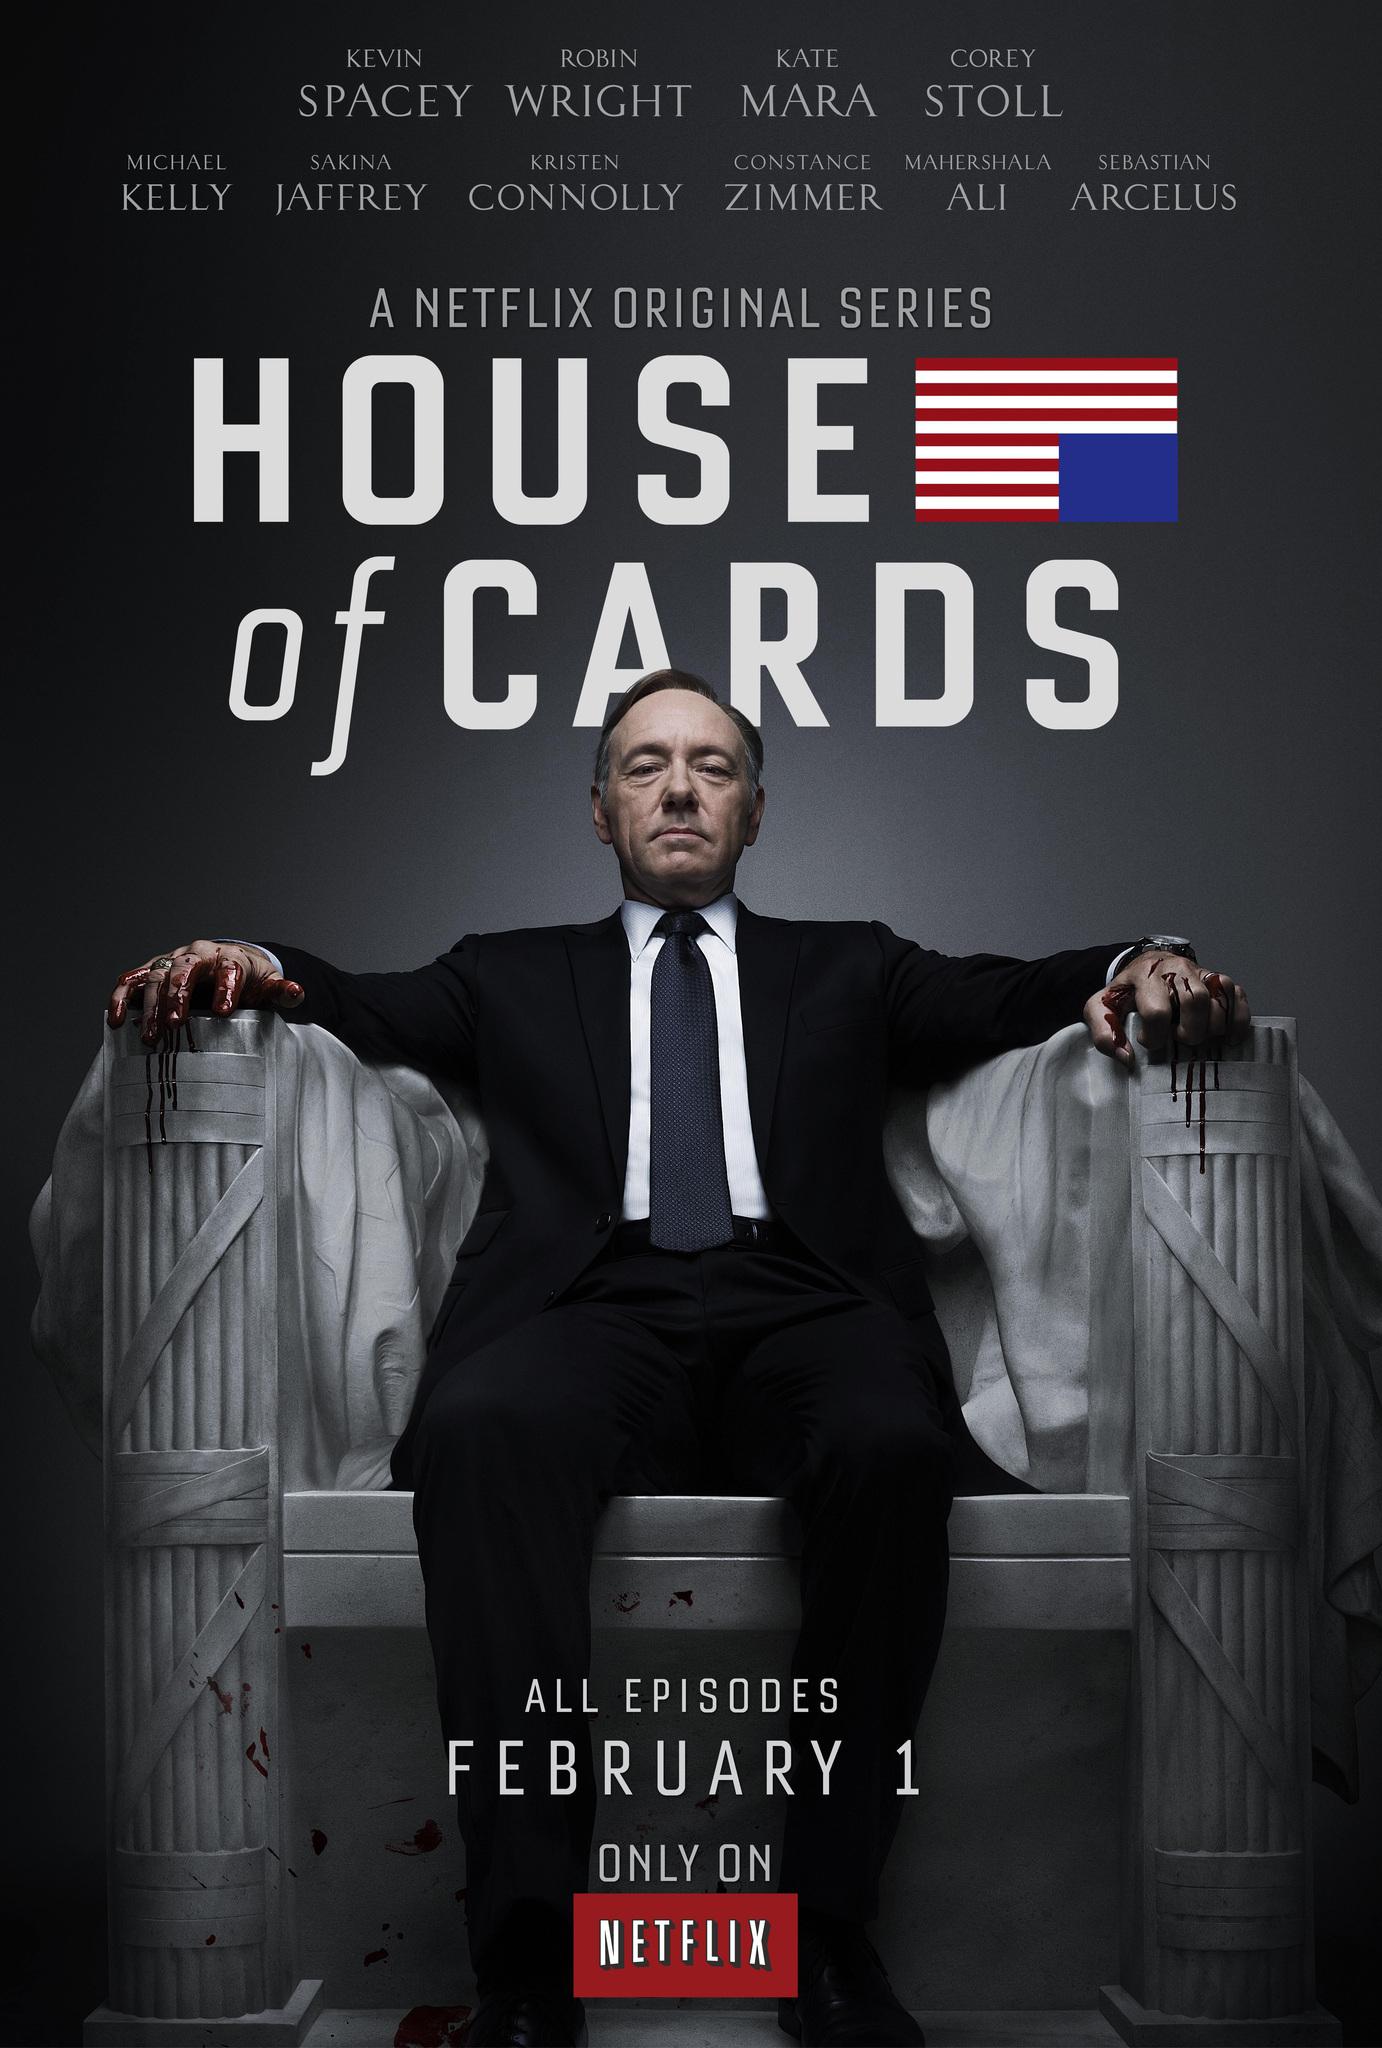 House of Cards - Culisele puterii (2013) - Film serial - CineMagia.ro